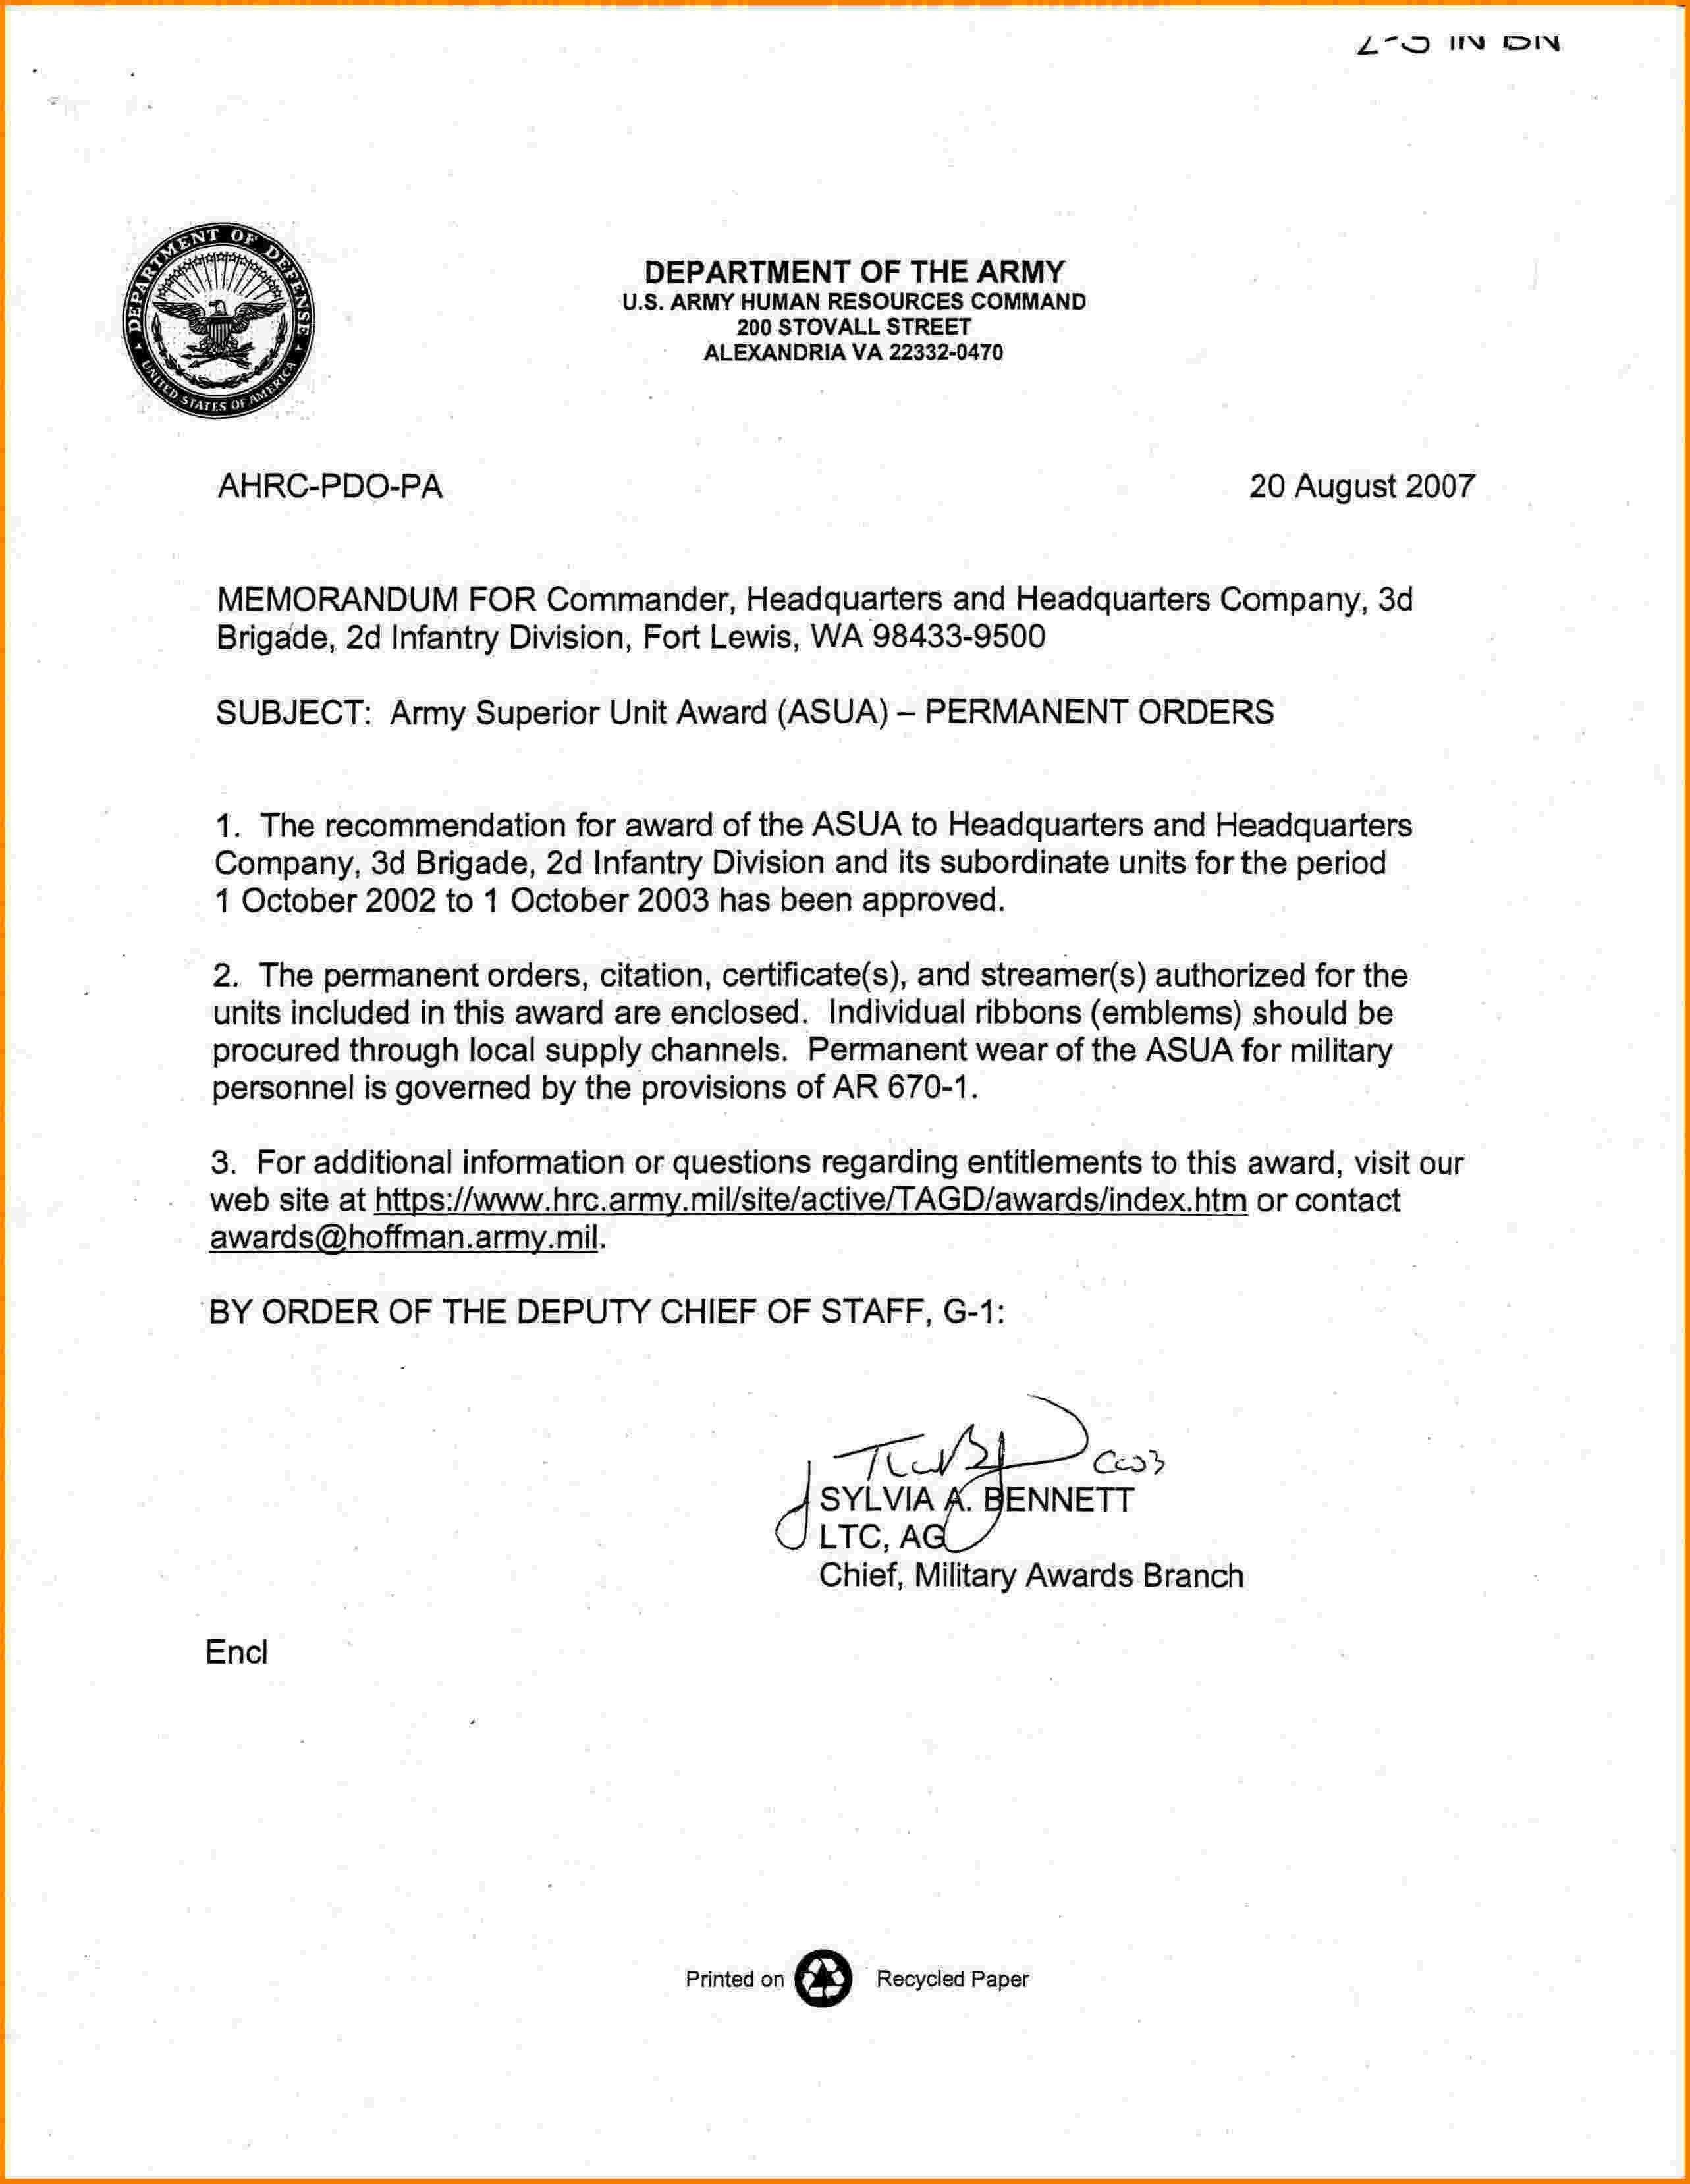 Memorandum for Record Army Memorandum format Army